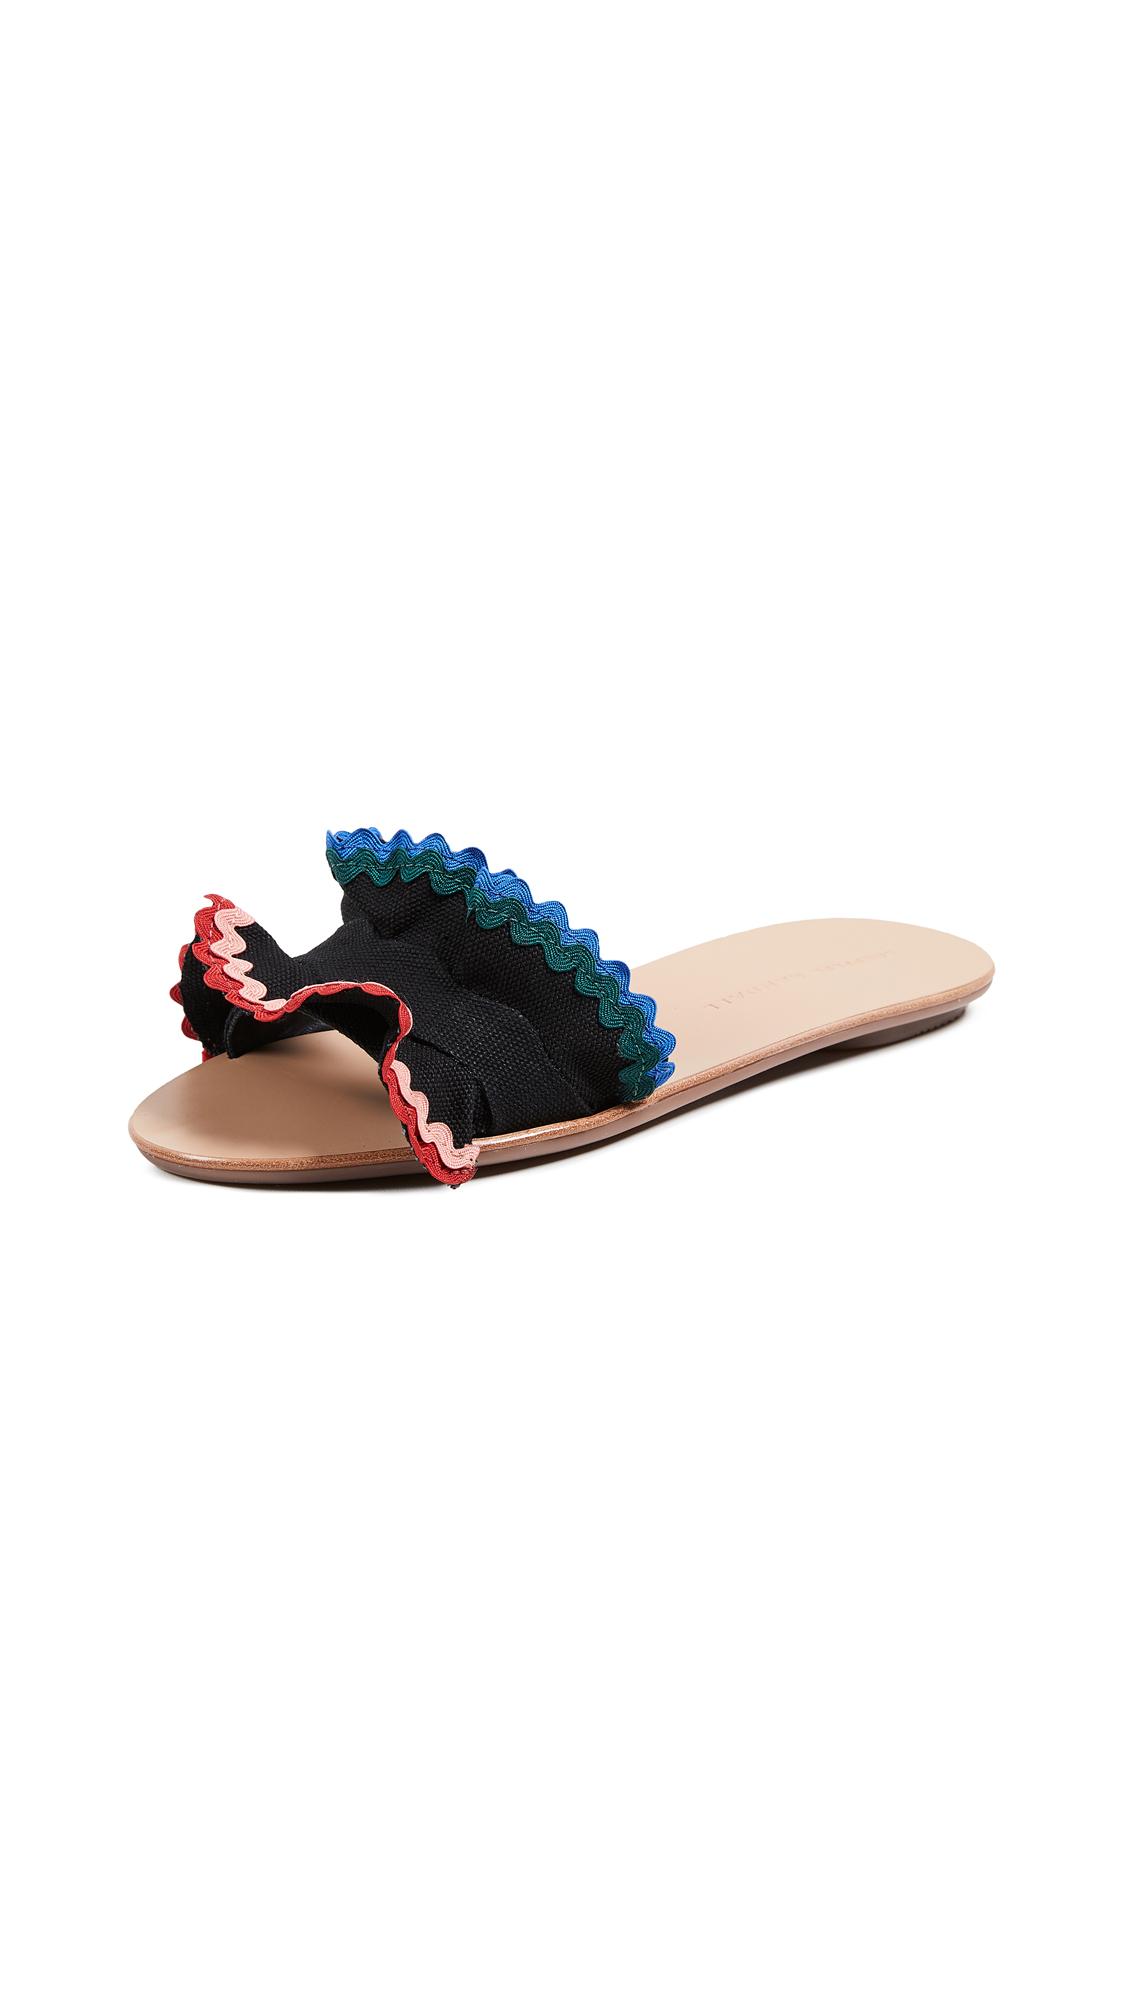 Loeffler Randall Birdie Ruffle Slides - Black/Multi